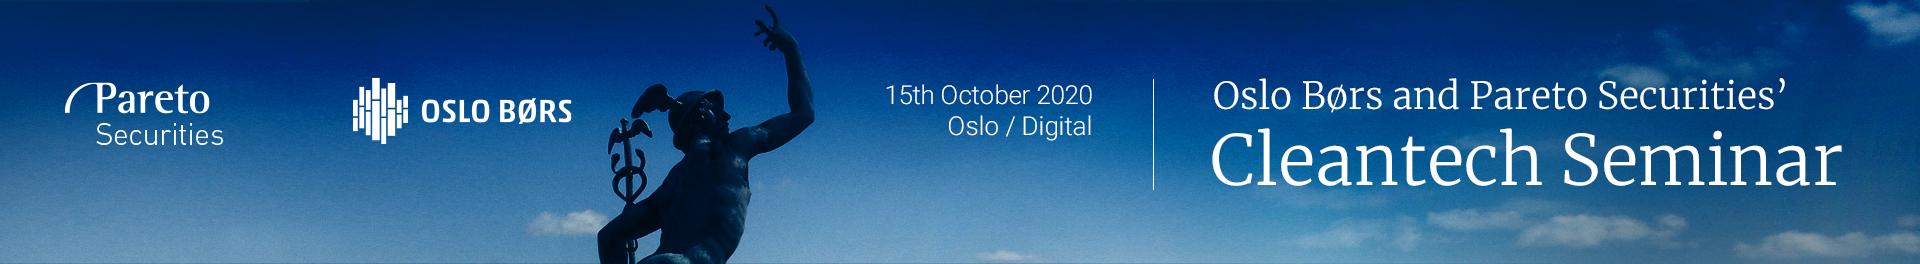 Header image for Oslo Børs and Pareto Securities' Virtual Cleantech Seminar